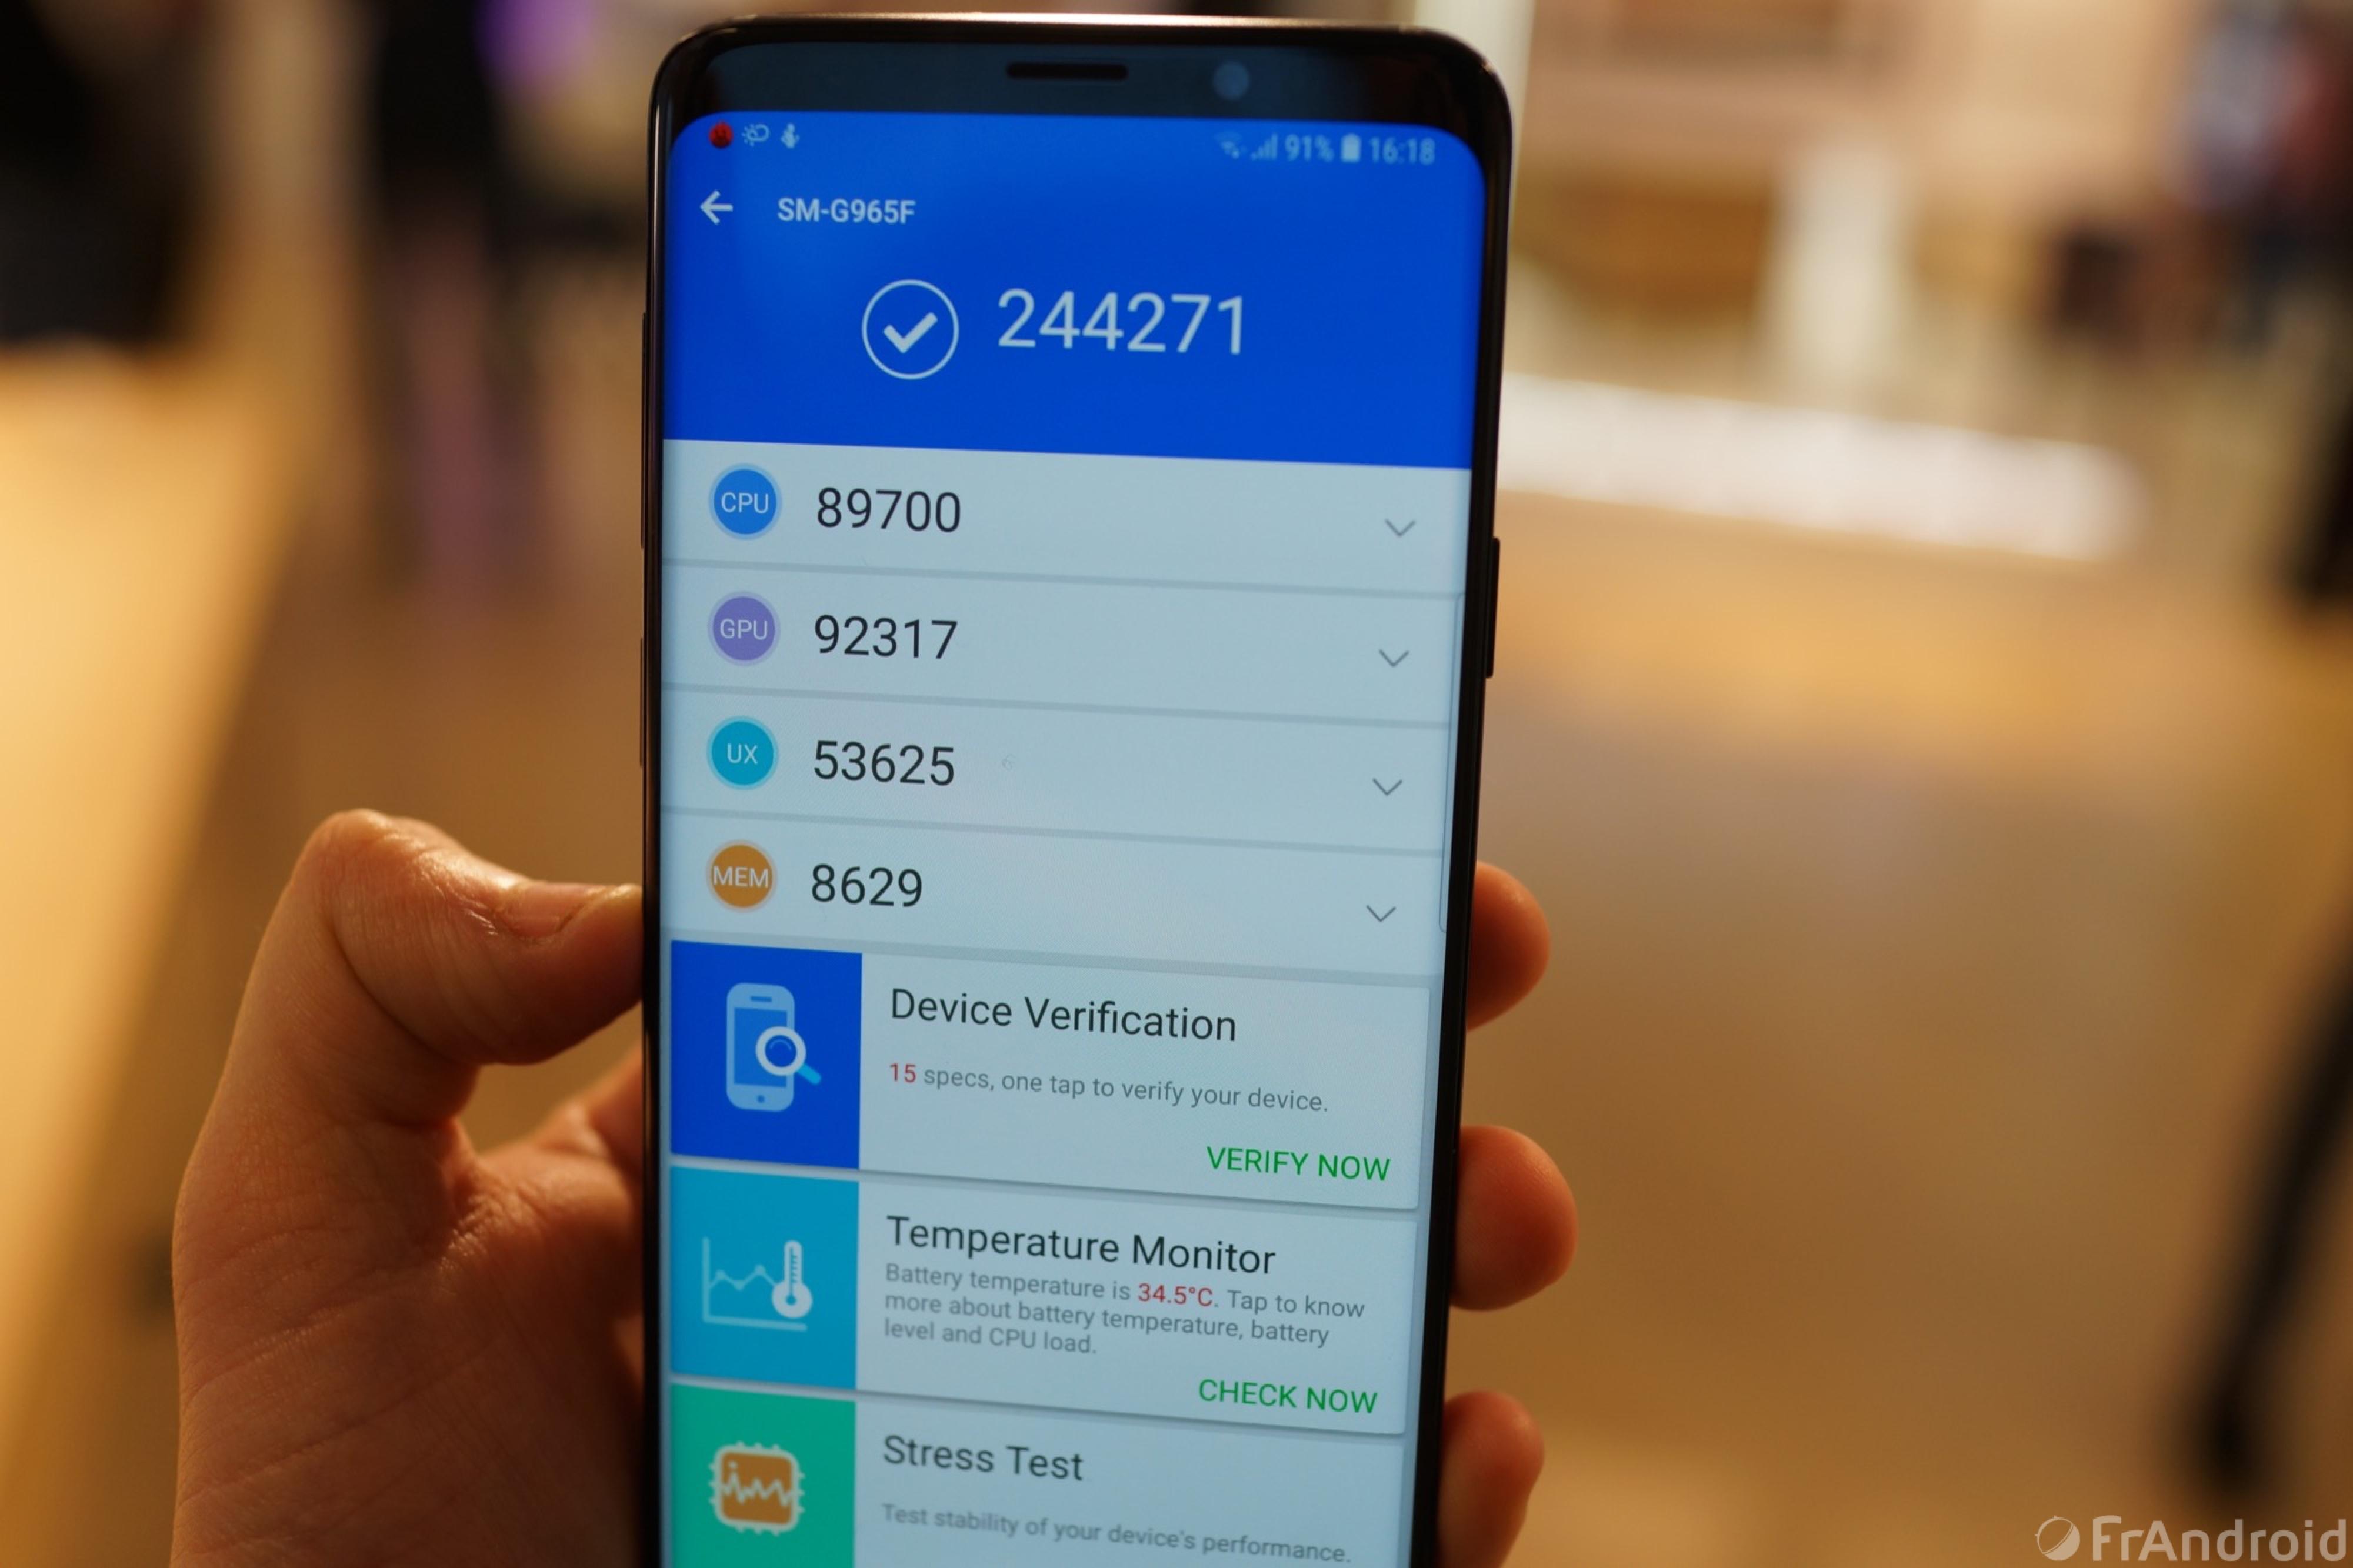 Prise En Main Du Samsung Galaxy S9 Et Du Galaxy S9 Frandroid